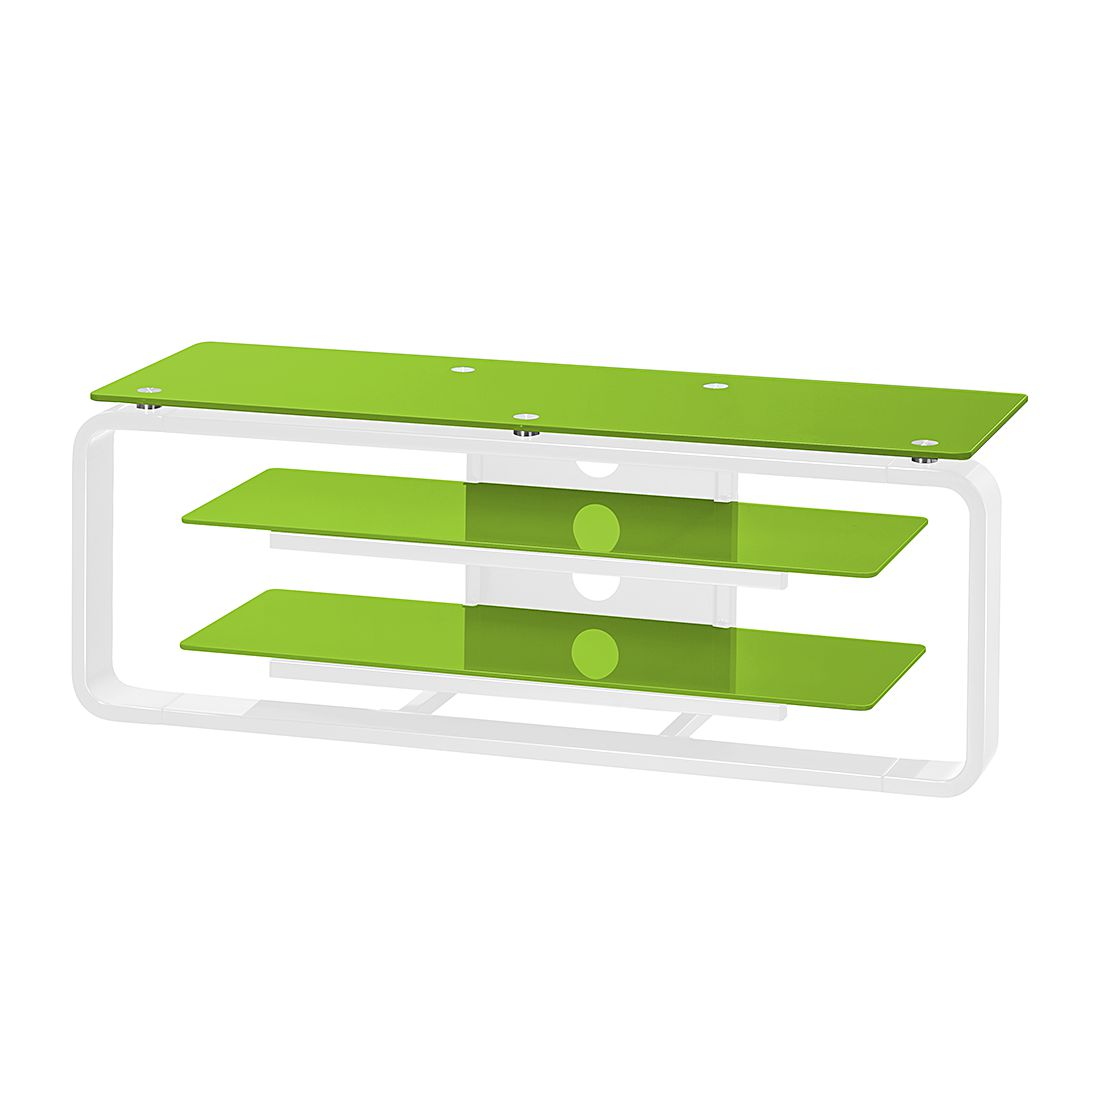 Meuble TV Rack Jared I - Blanc / Verre vert - 110 cm, Maja Möbel